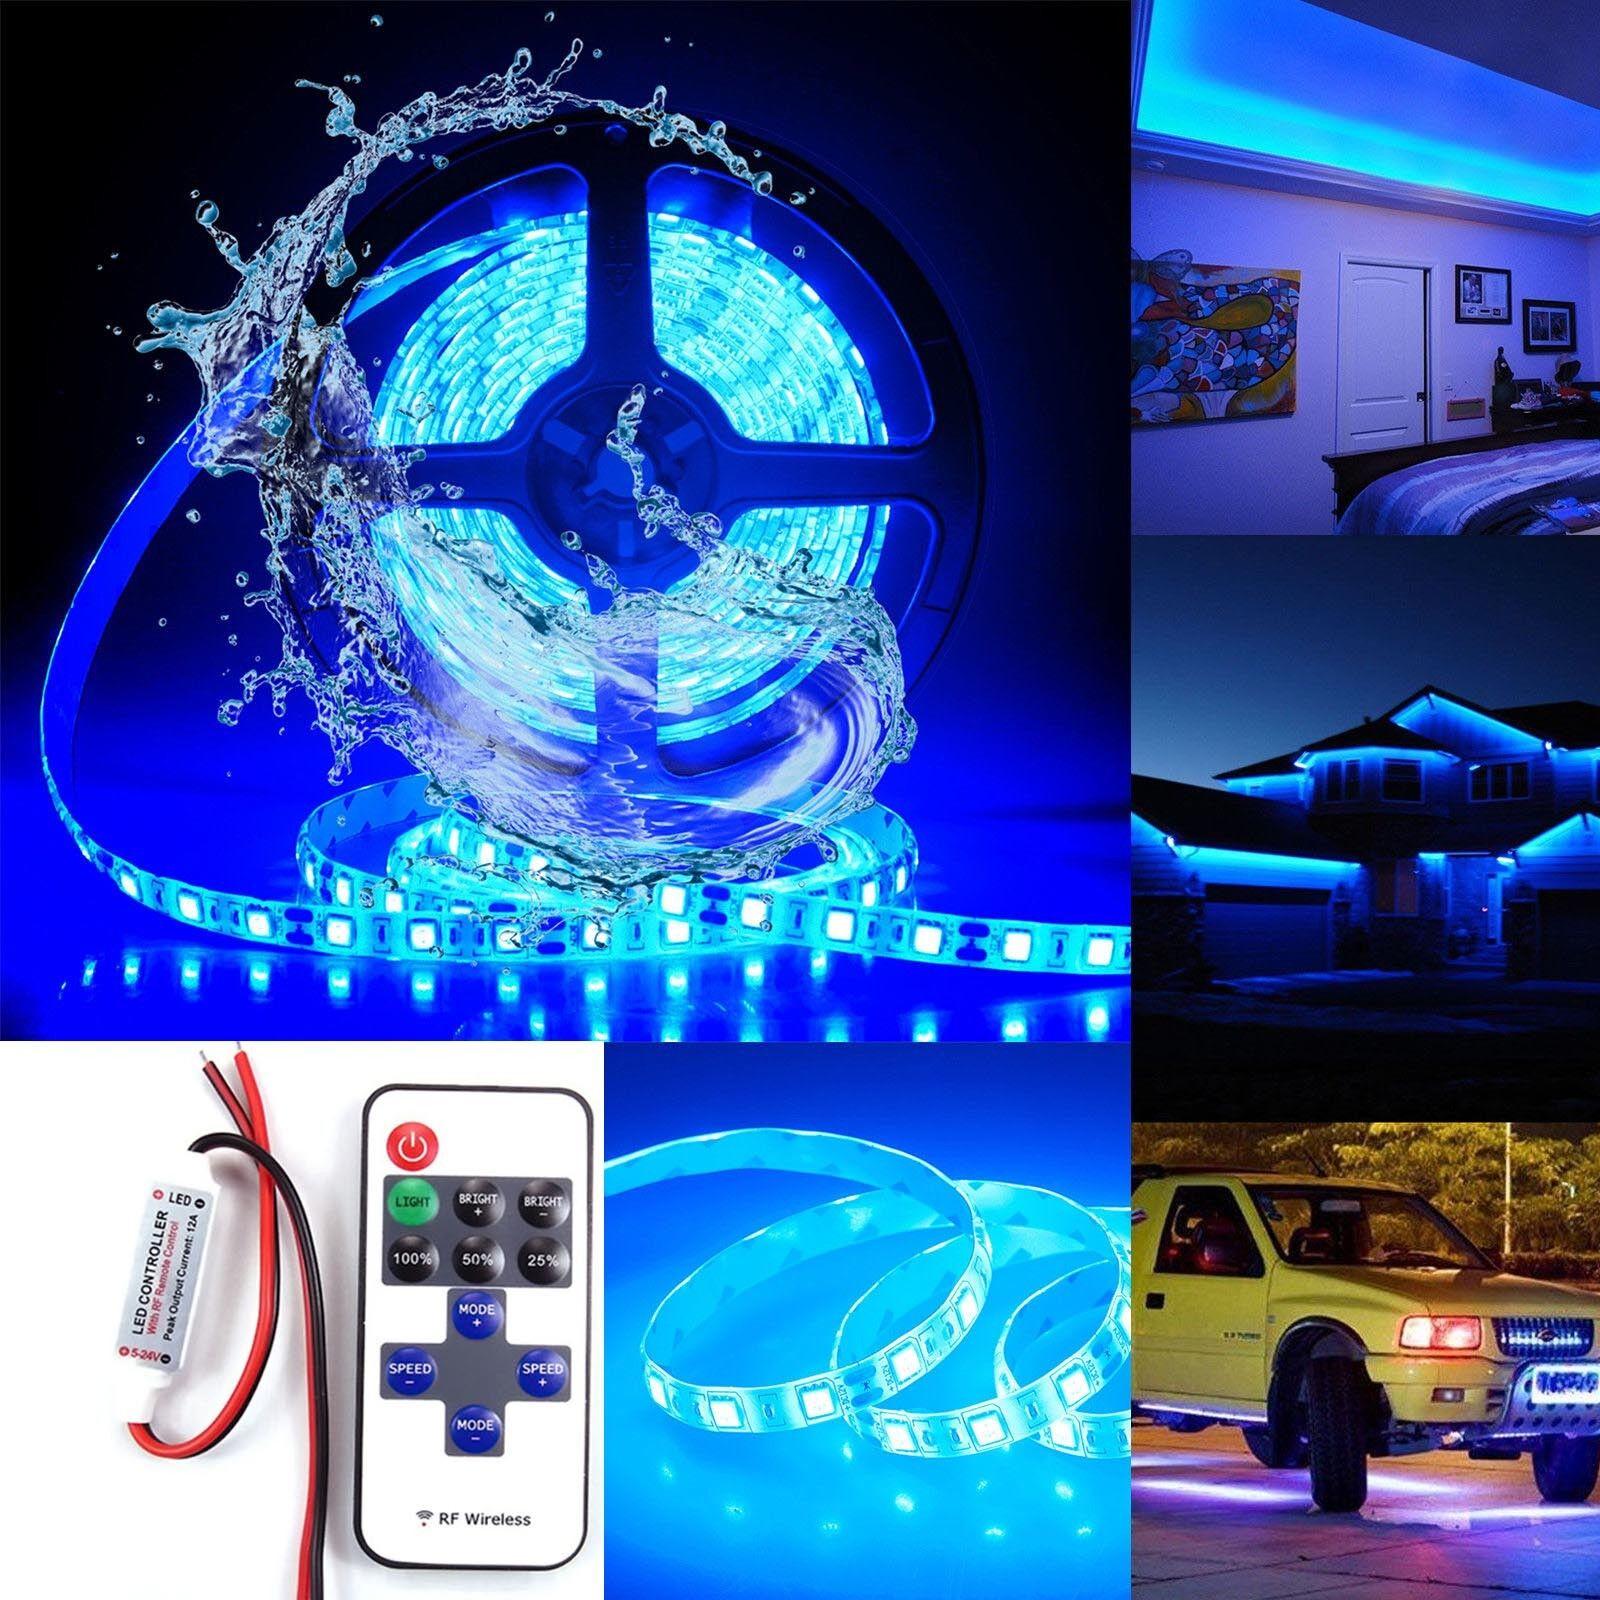 Wireless Waterproof LED Blue Strip Light 16FT For Boat Truck Car Suv Rv ATV US